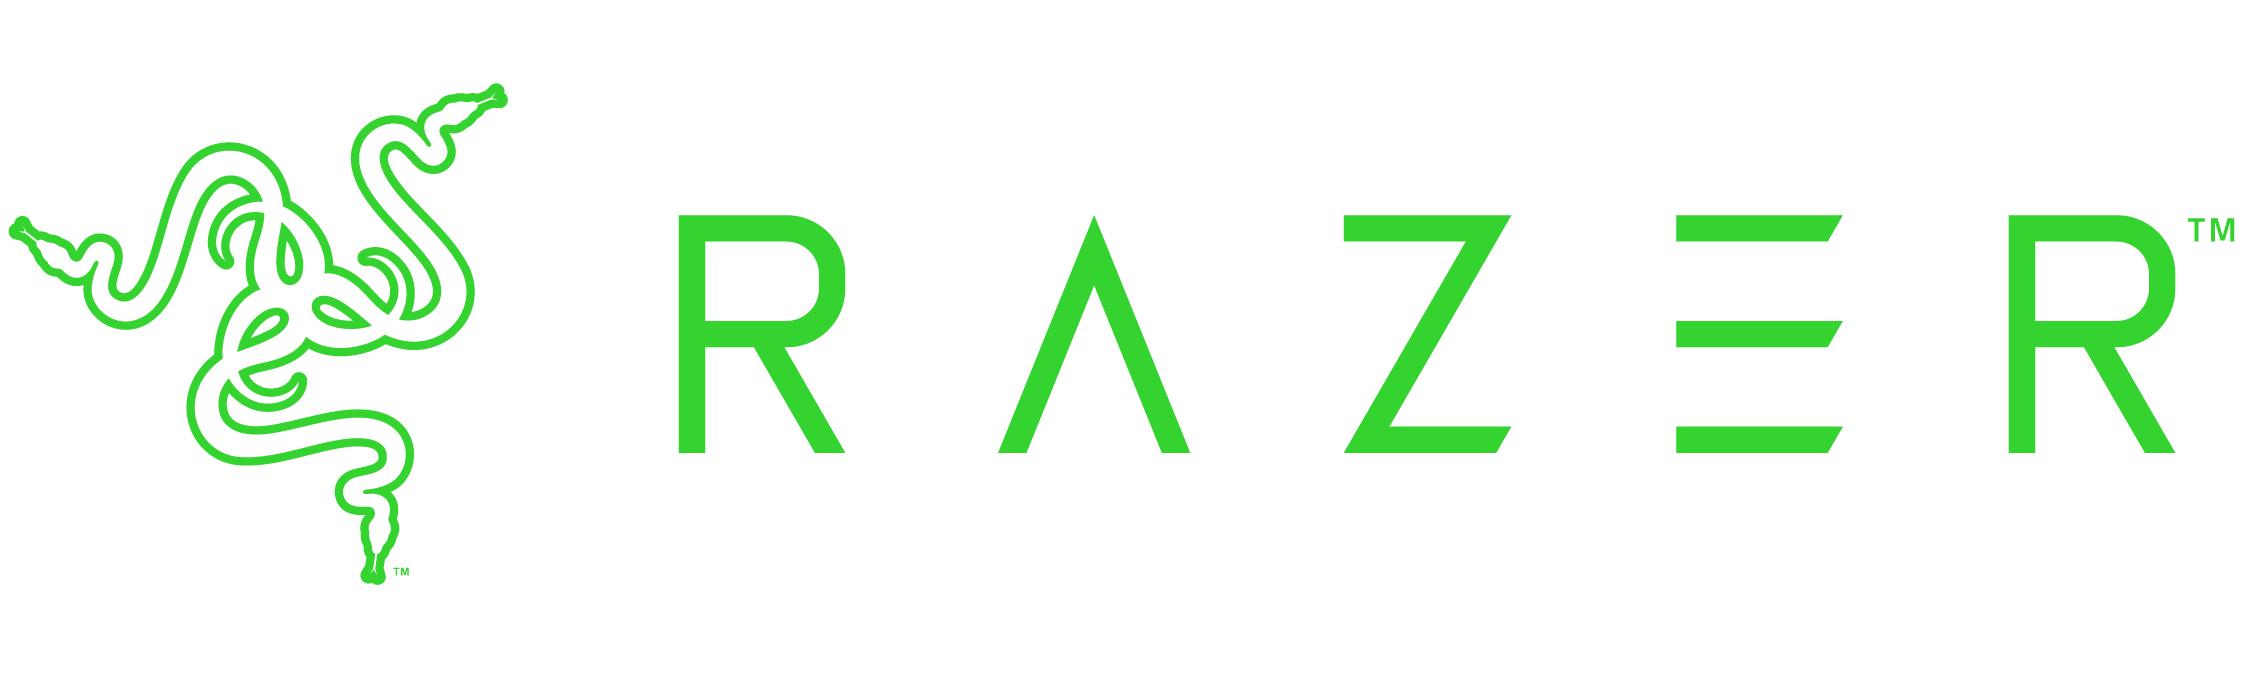 /images/r/Razer_new_logo_1.png